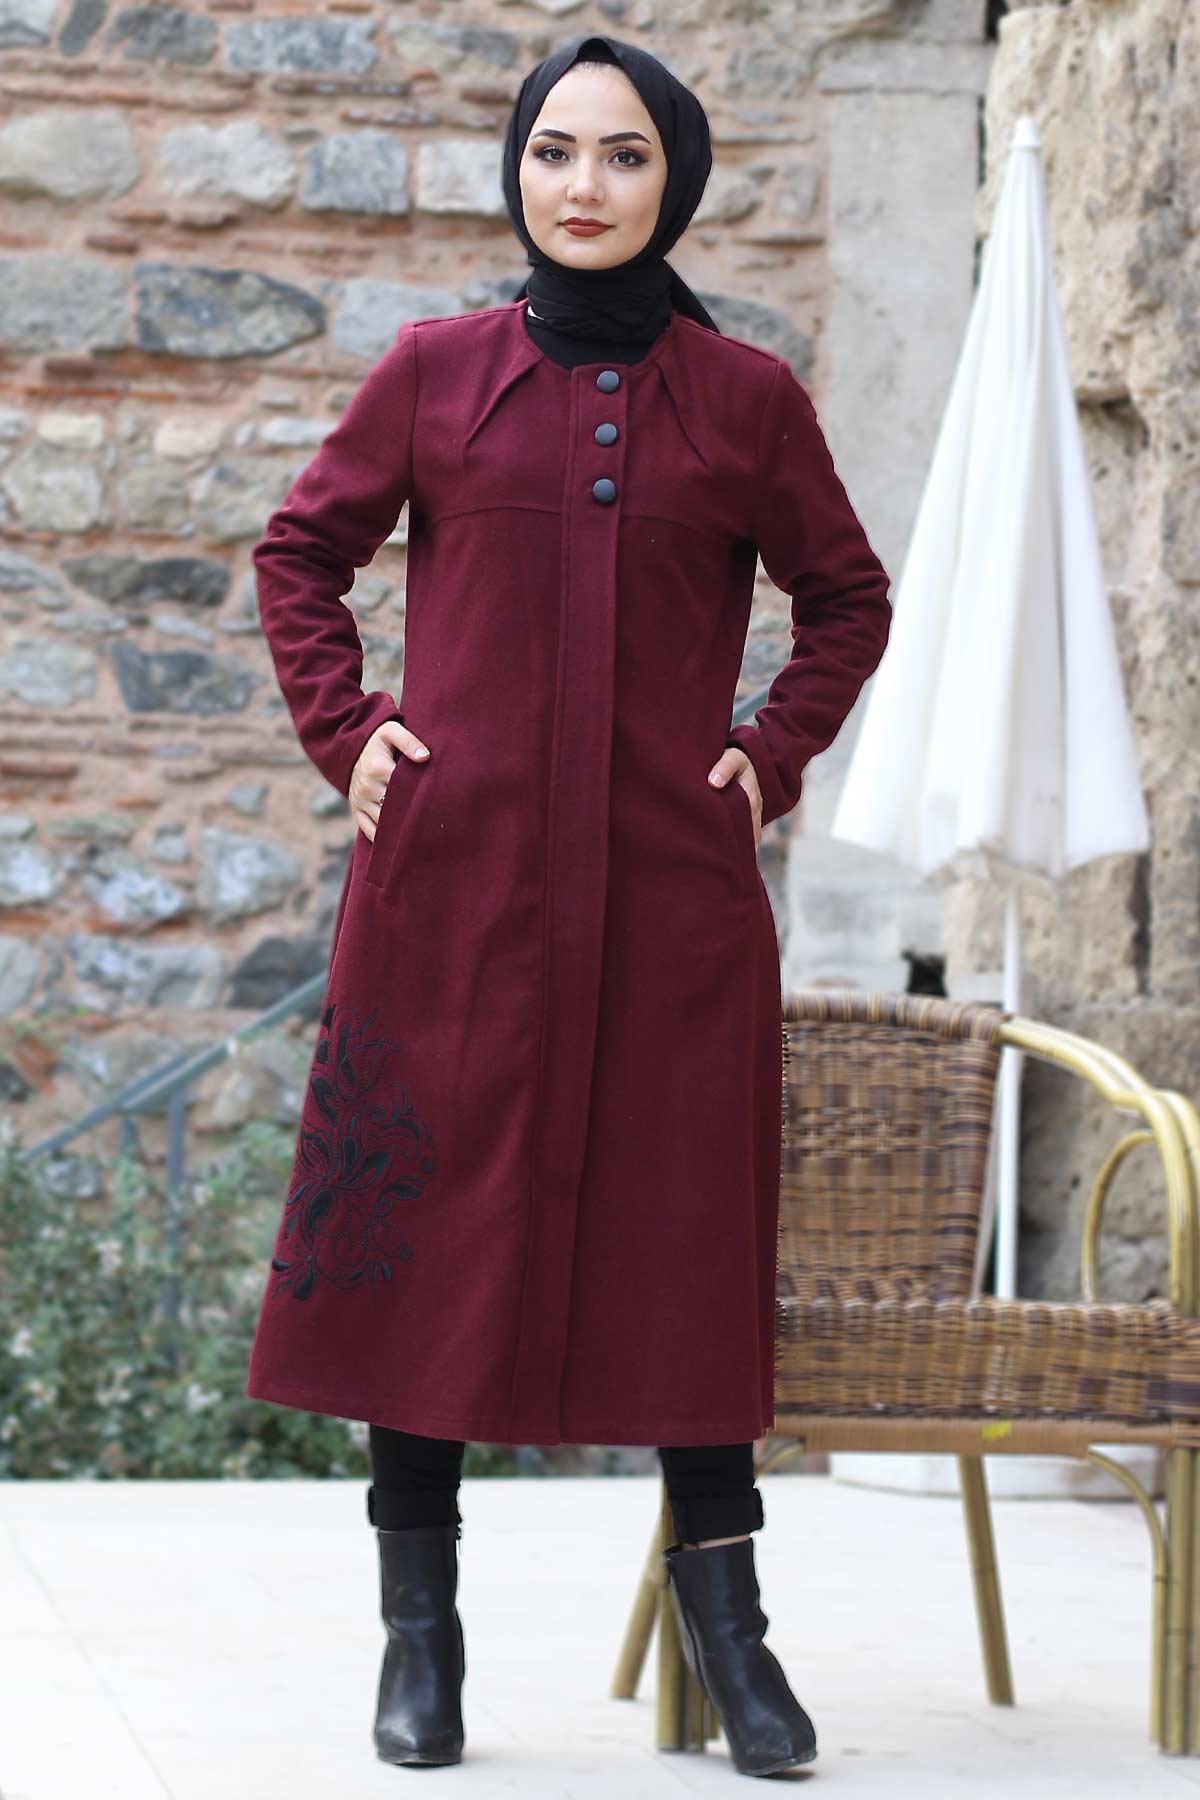 Embroidered Skirt Coat TSD0217 Claret Red